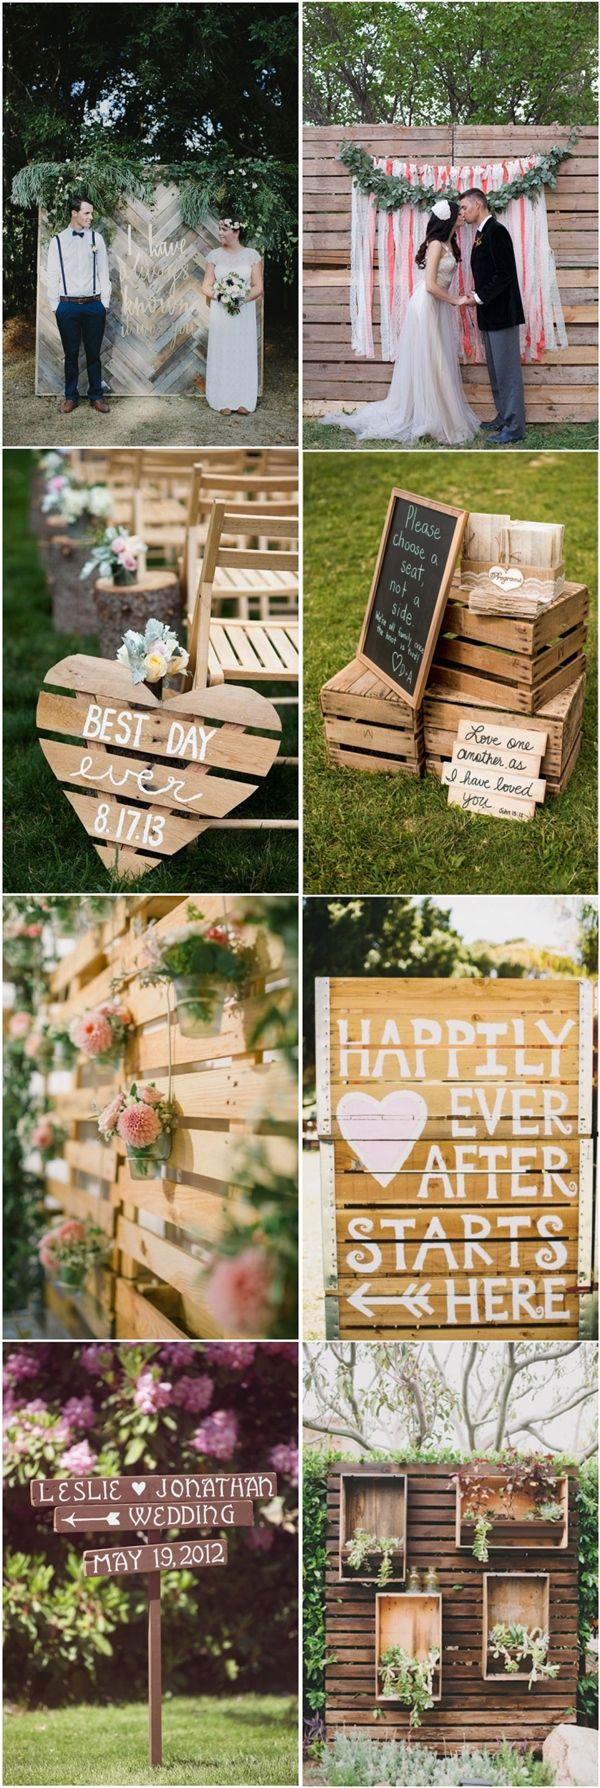 rustic country wood pallets wedding decor ideas  Deer Pearl Flowers